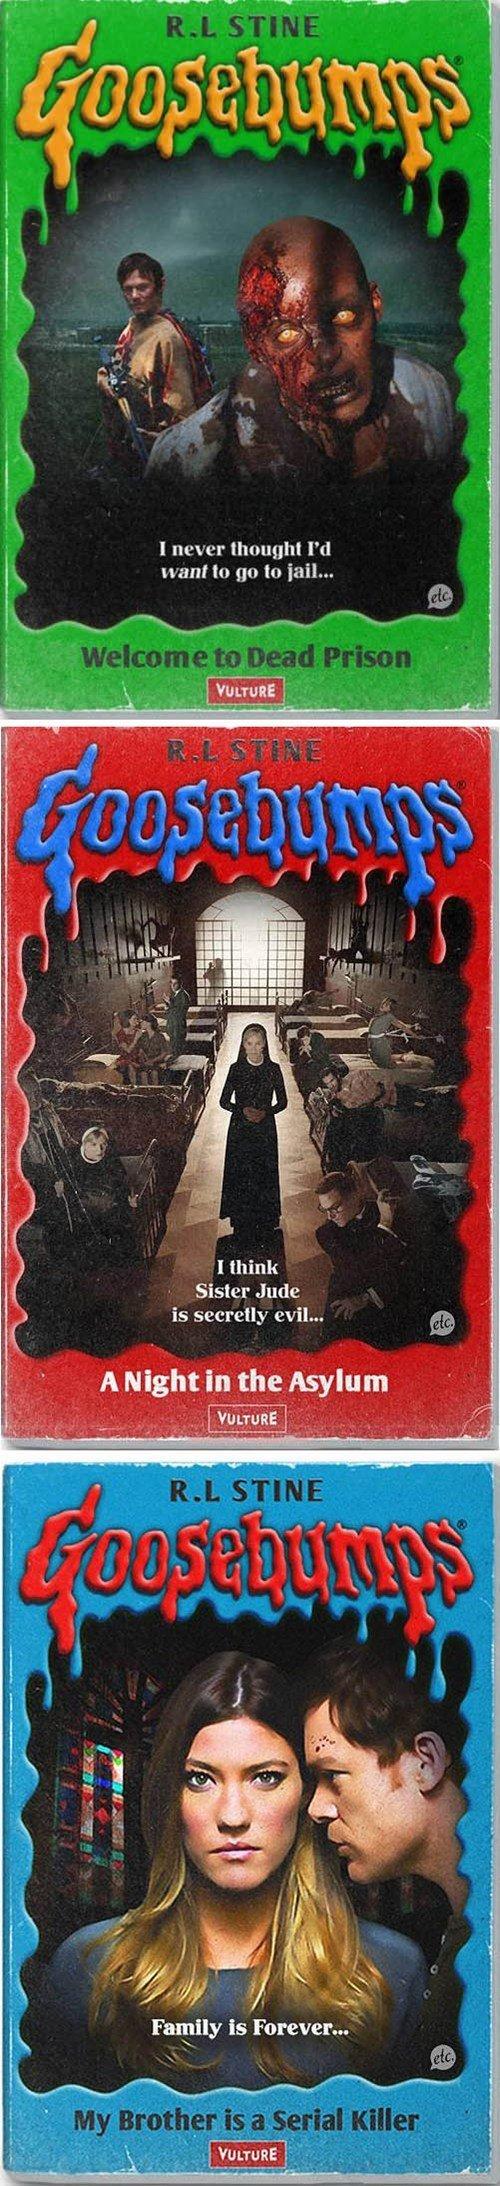 Goosebumps rock.. (Y). I never I' d I think Sister Jude is secretly evil... A Night In the Asylum. last one is dexter? hi Nancy